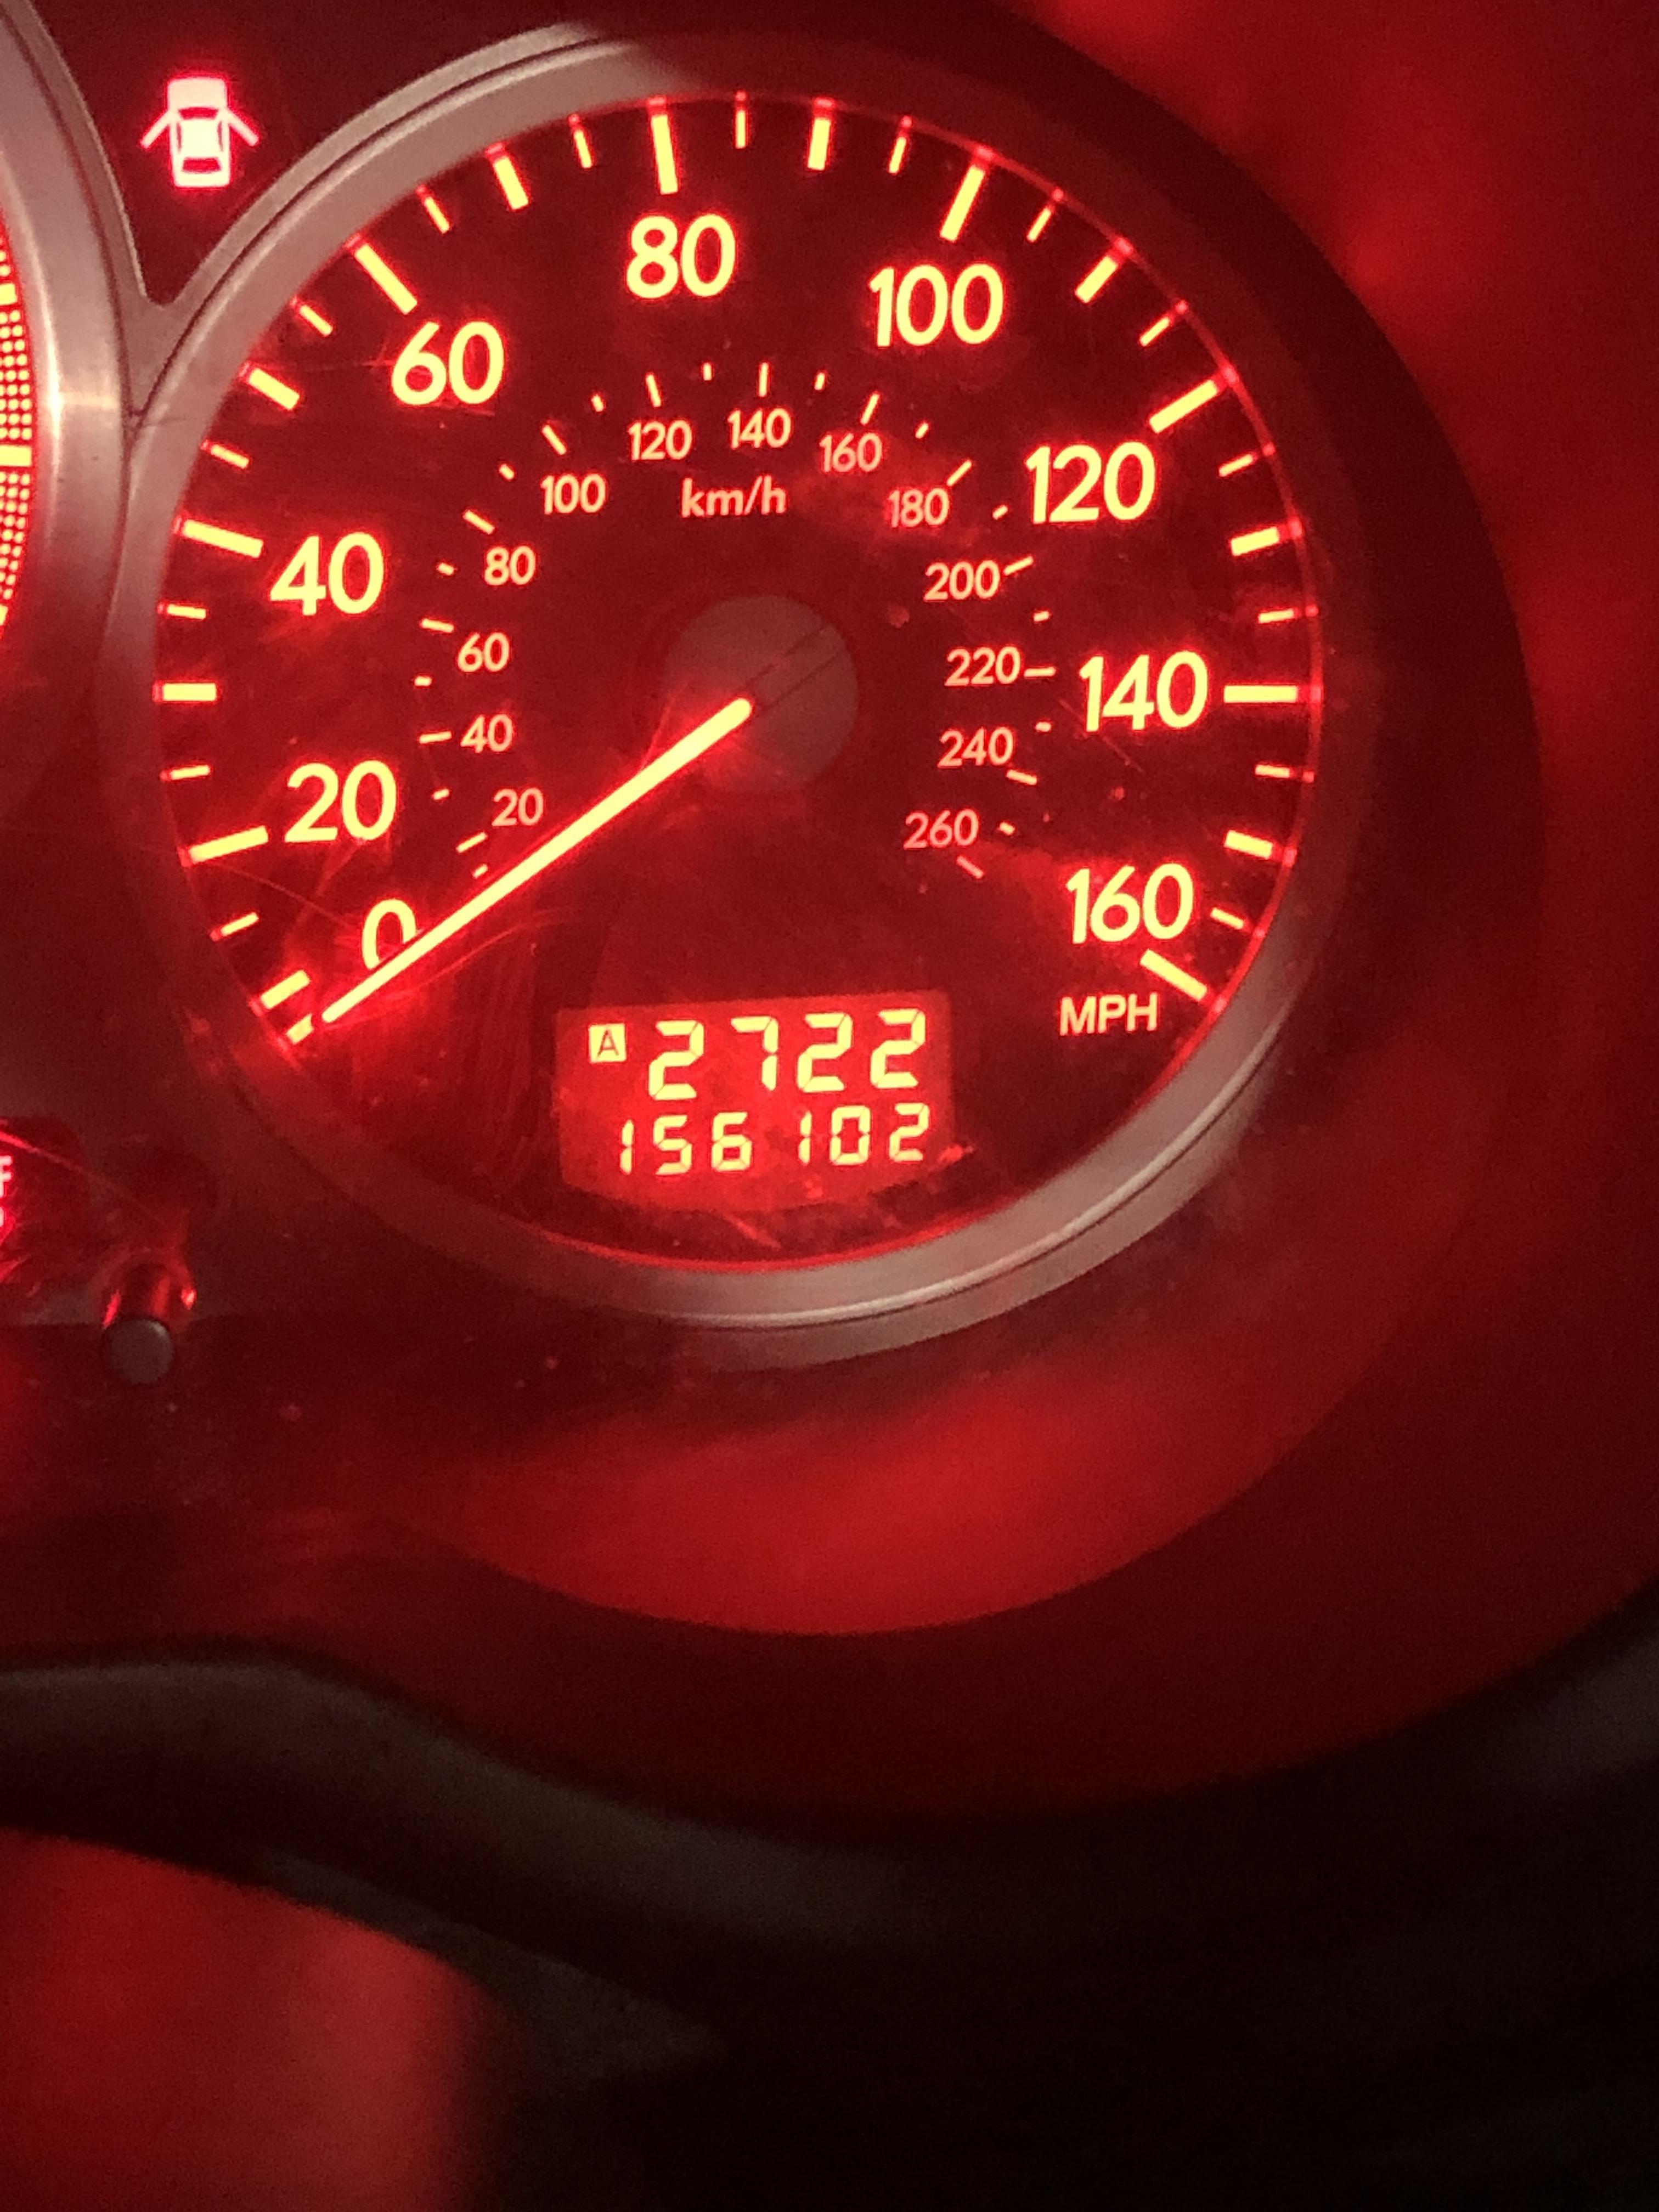 New car need some help-3a730dc2-3482-4500-876b-d2e8d2b38389_1572020821324-jpeg